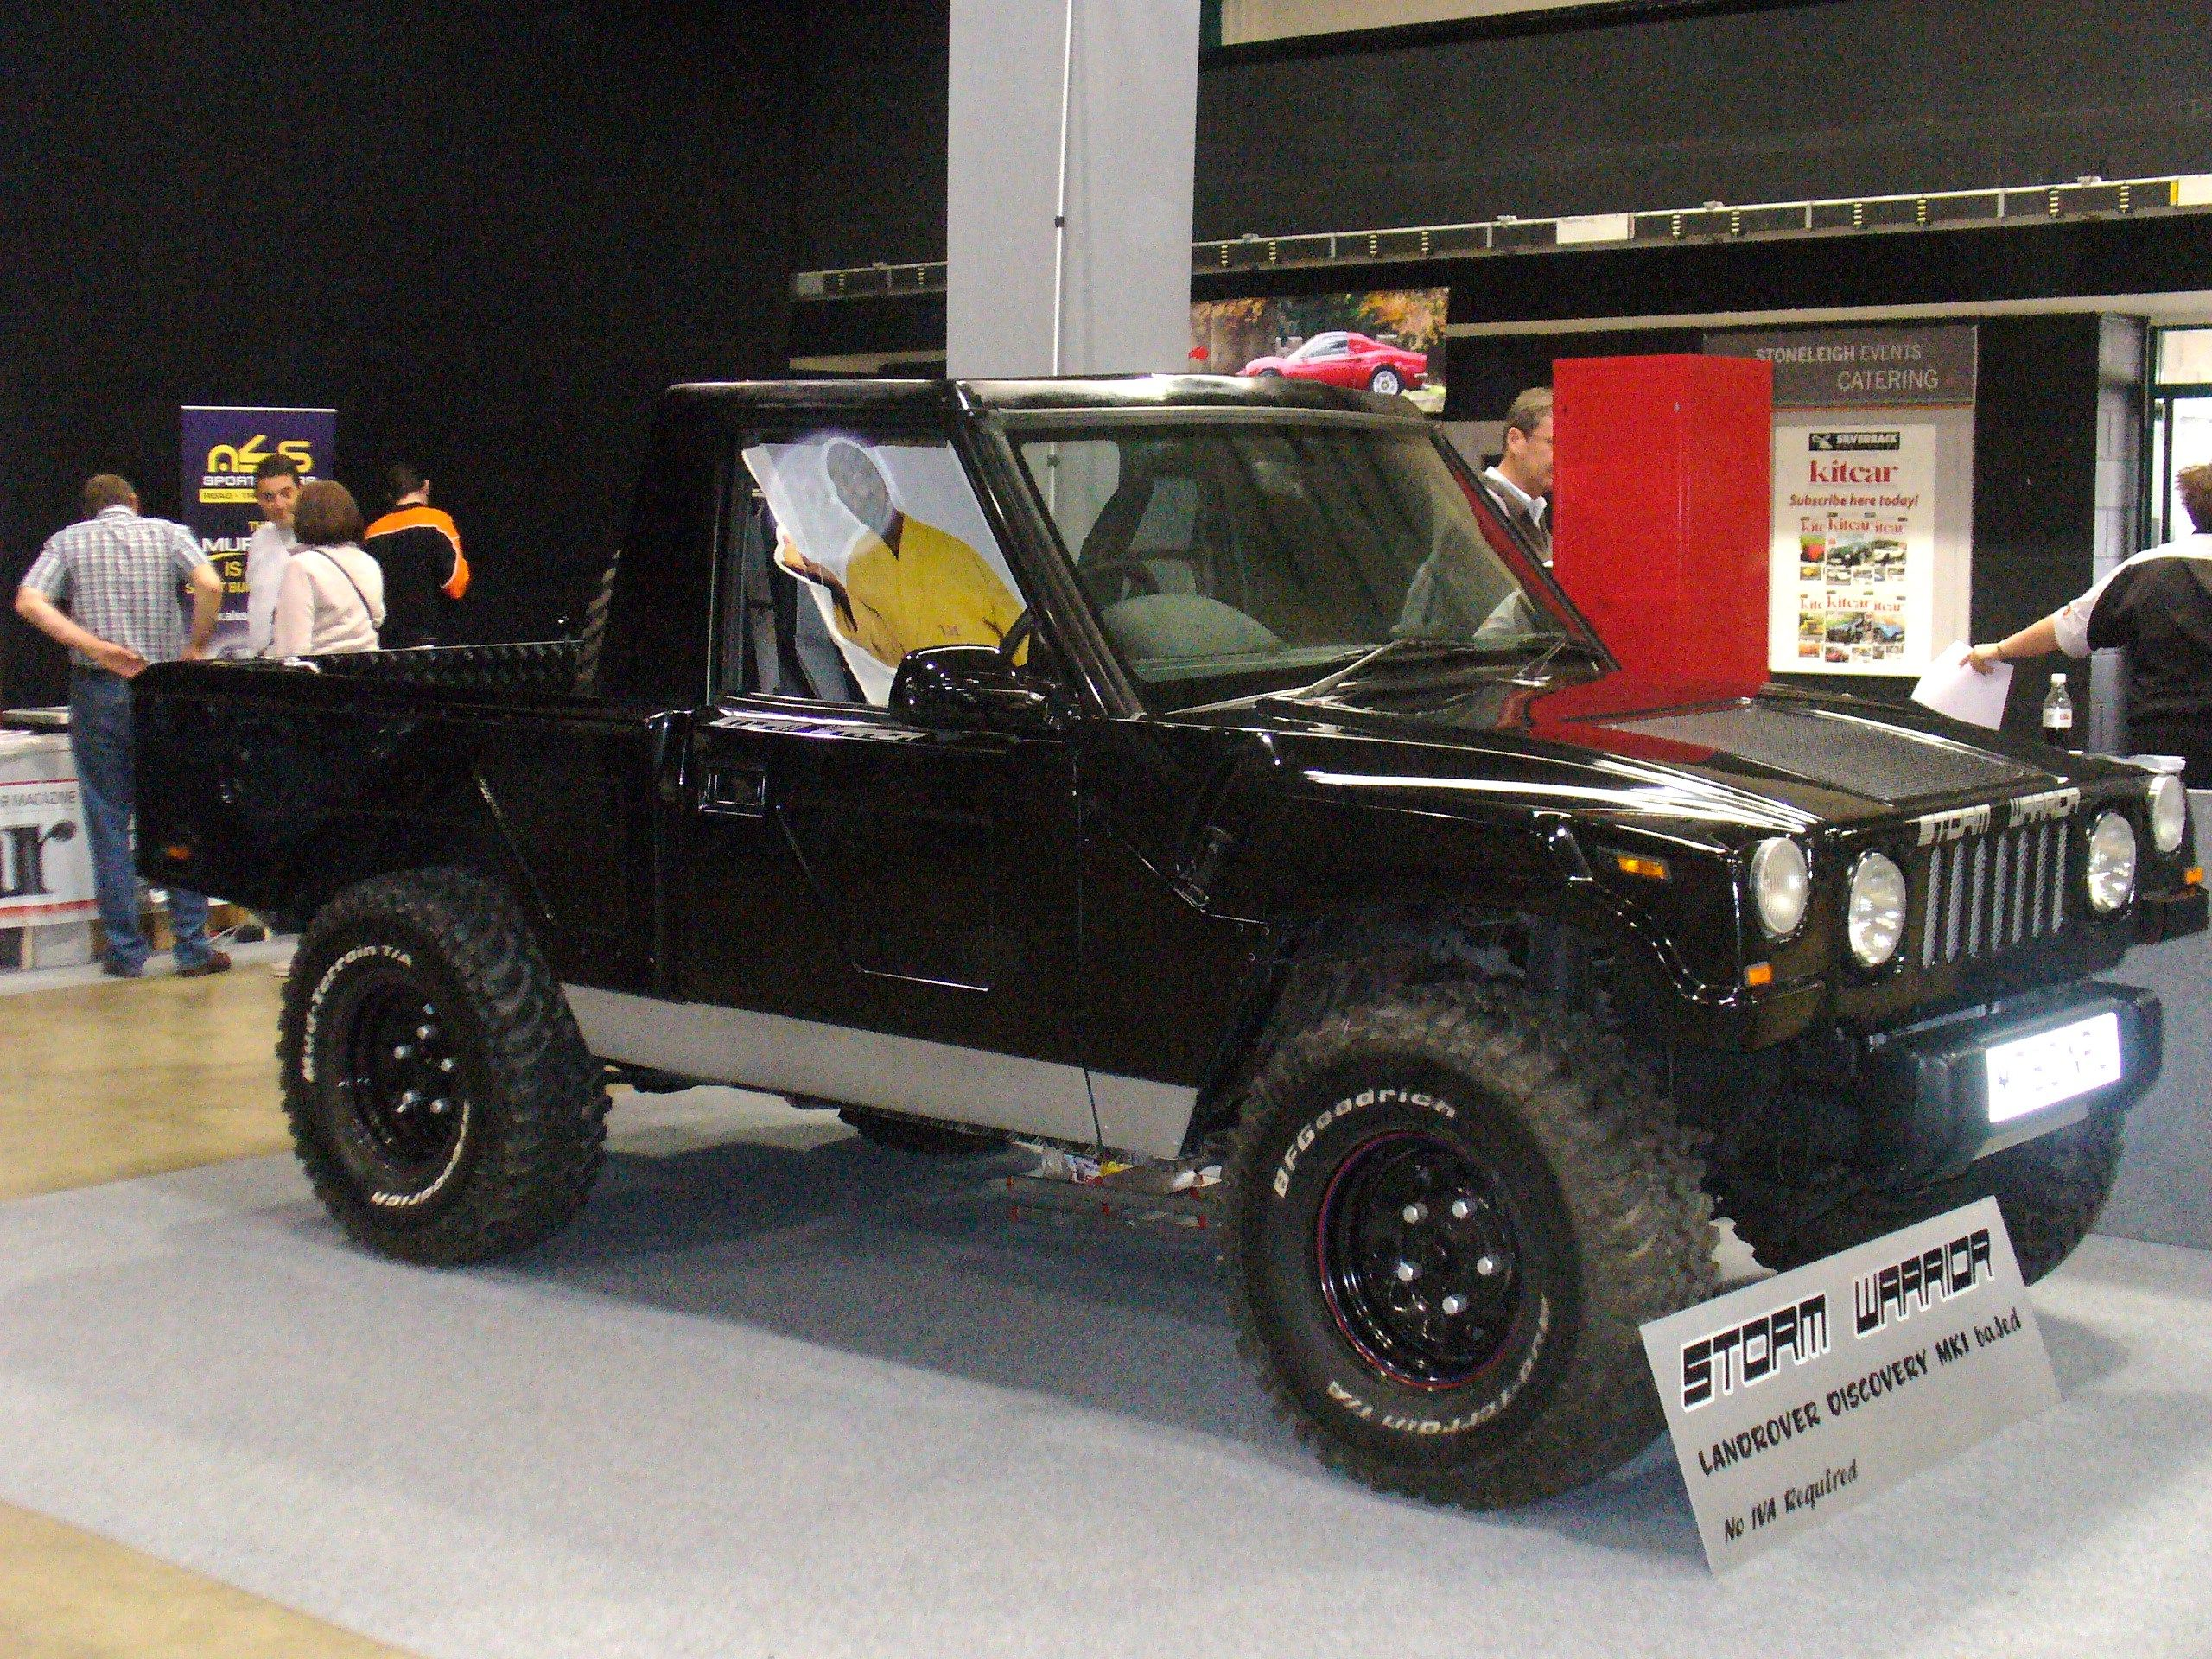 Storm Warrior 2 Thunderwagon Landrover Disco Mk1 Based Kit Car